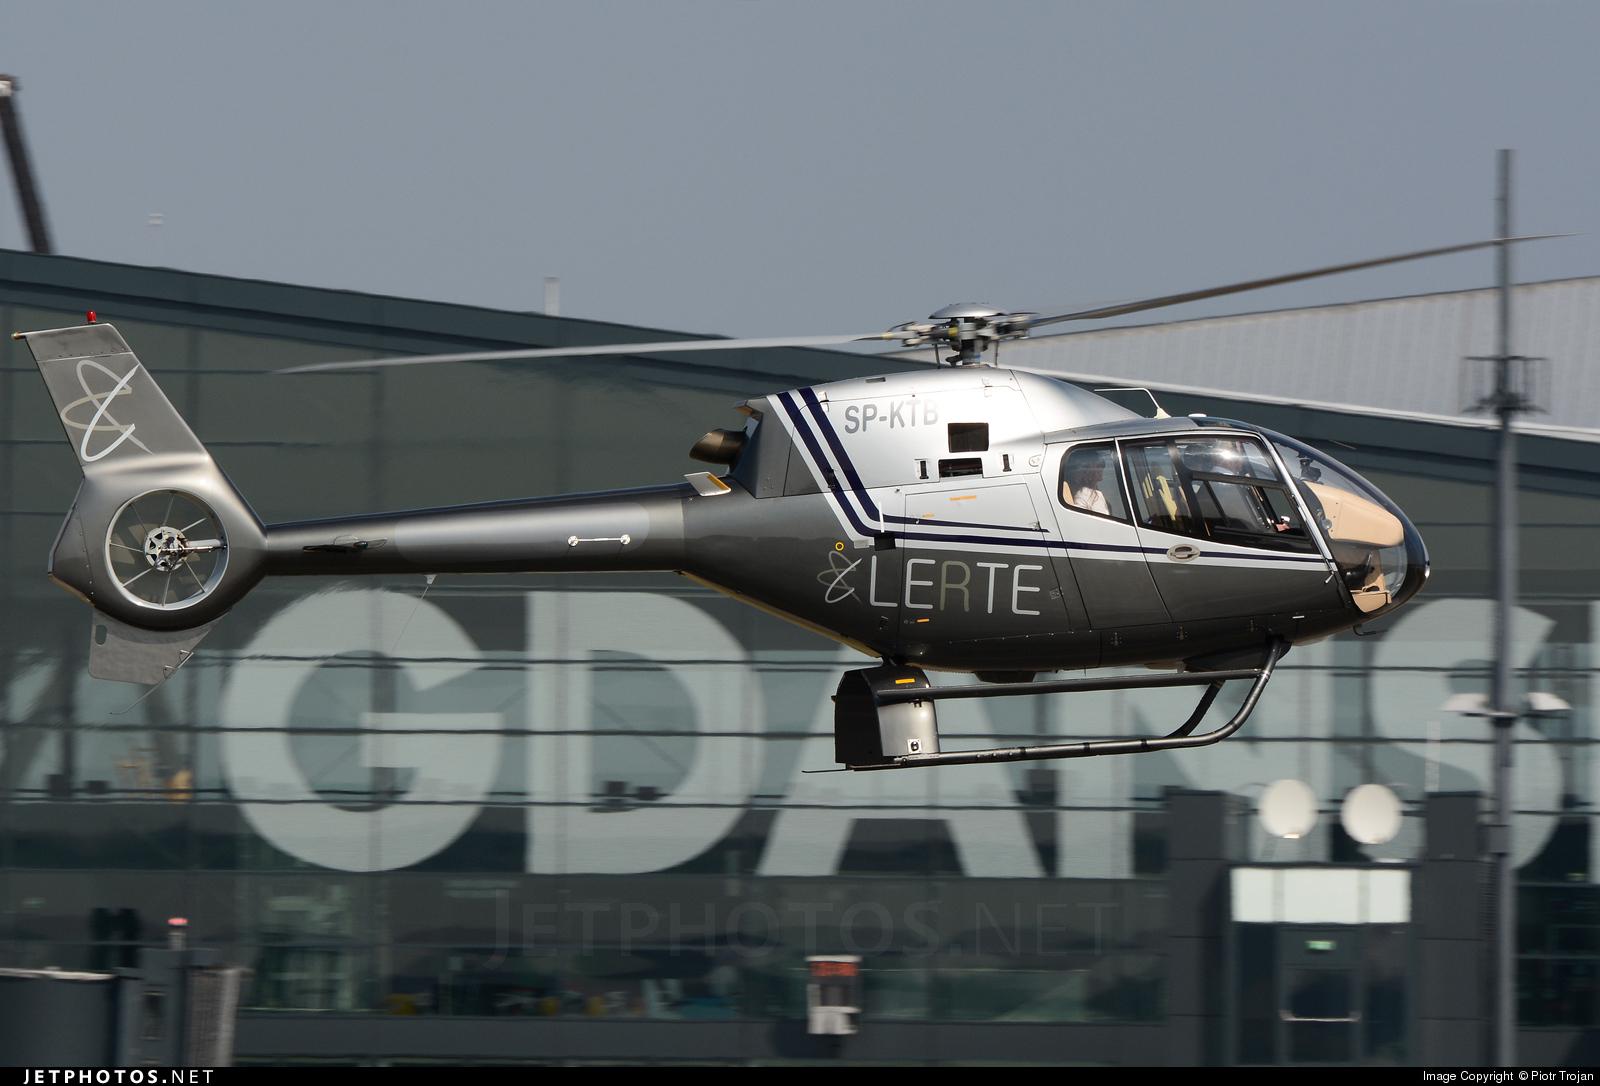 SP-KTB - Eurocopter EC 120B Colibri - Private